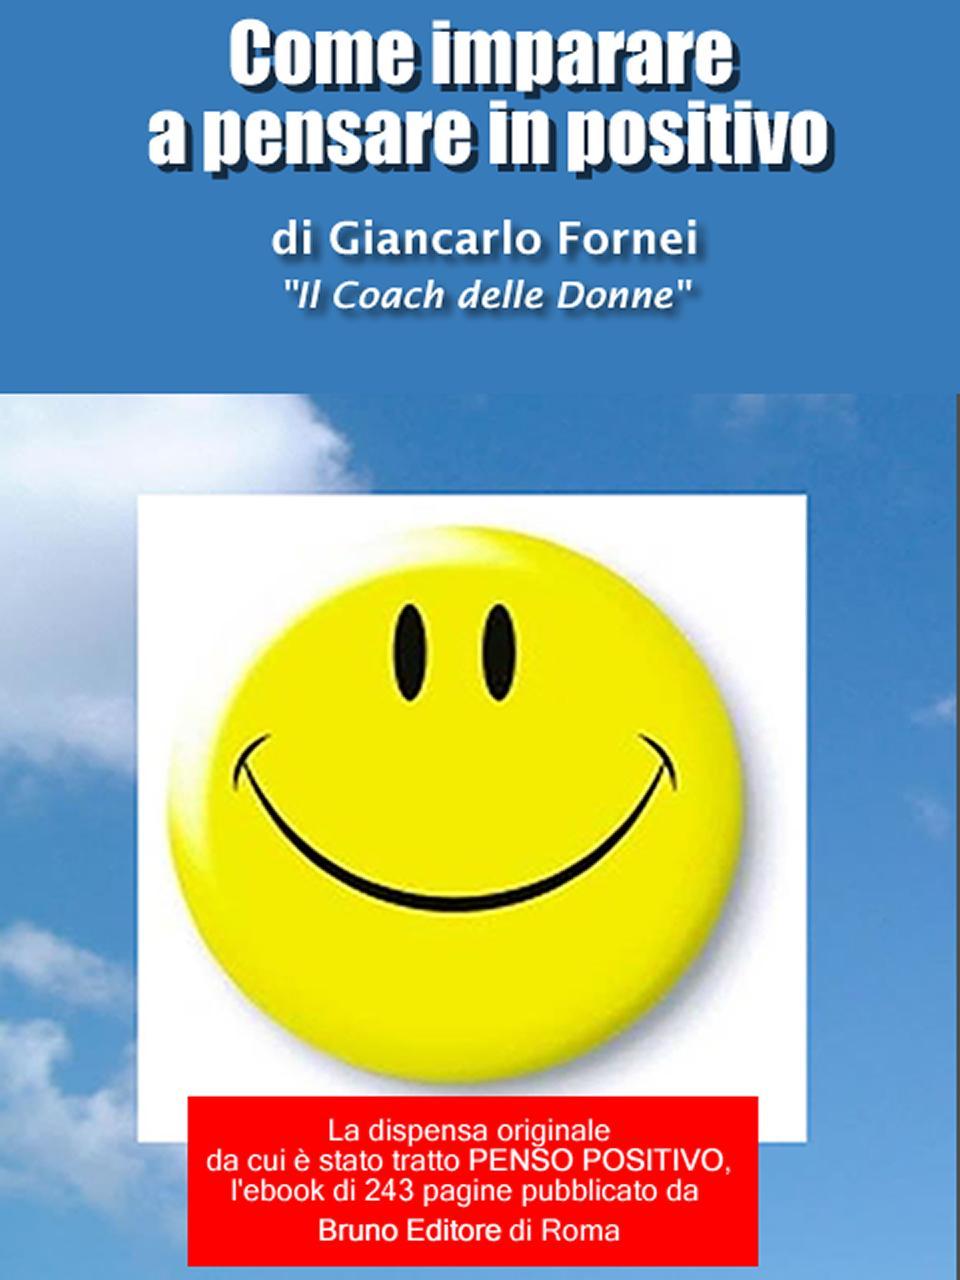 Mailing List di Giancarlo Fornei